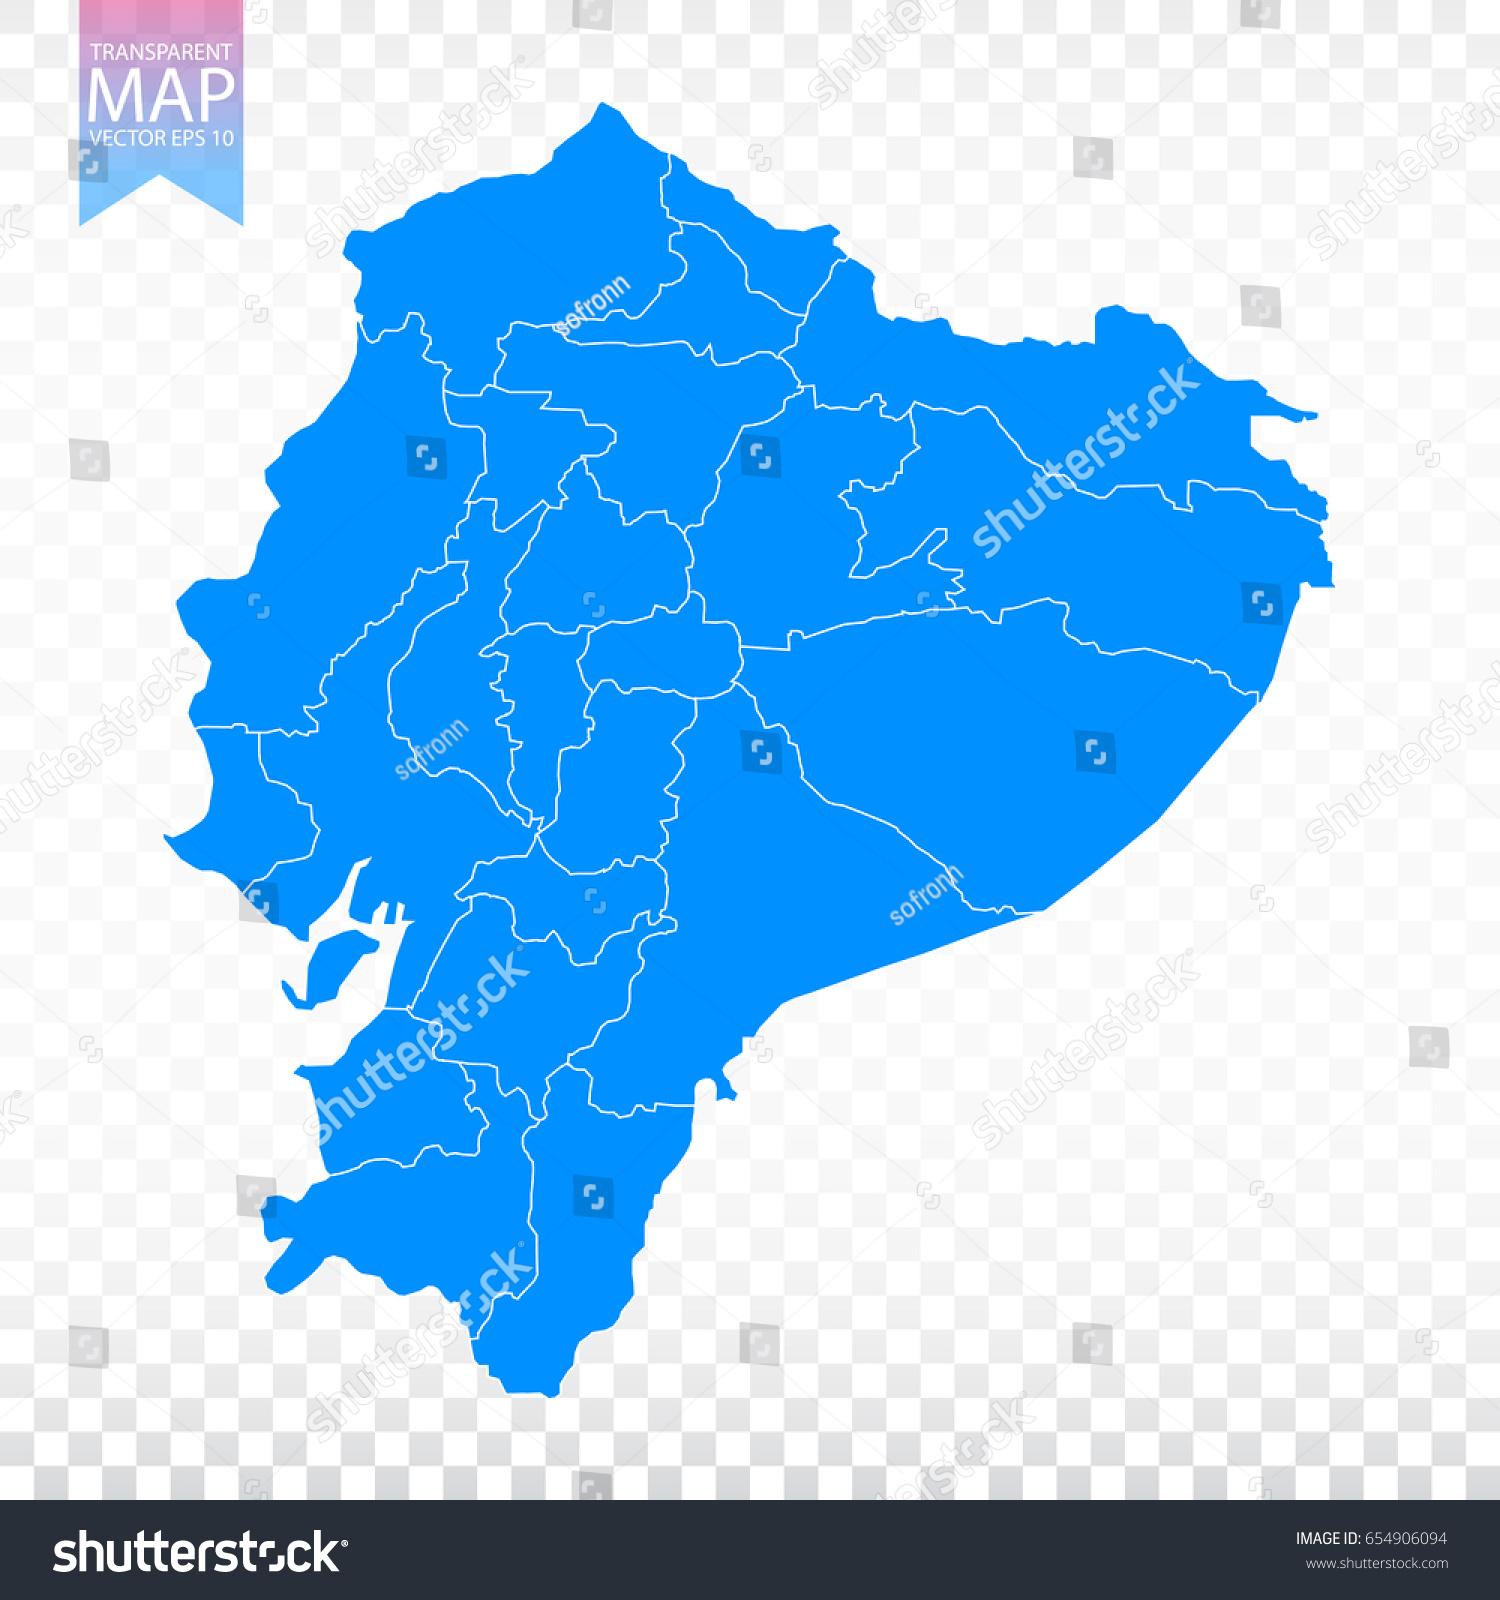 transparent high detailed blue map of ecuador vector illustration eps 10